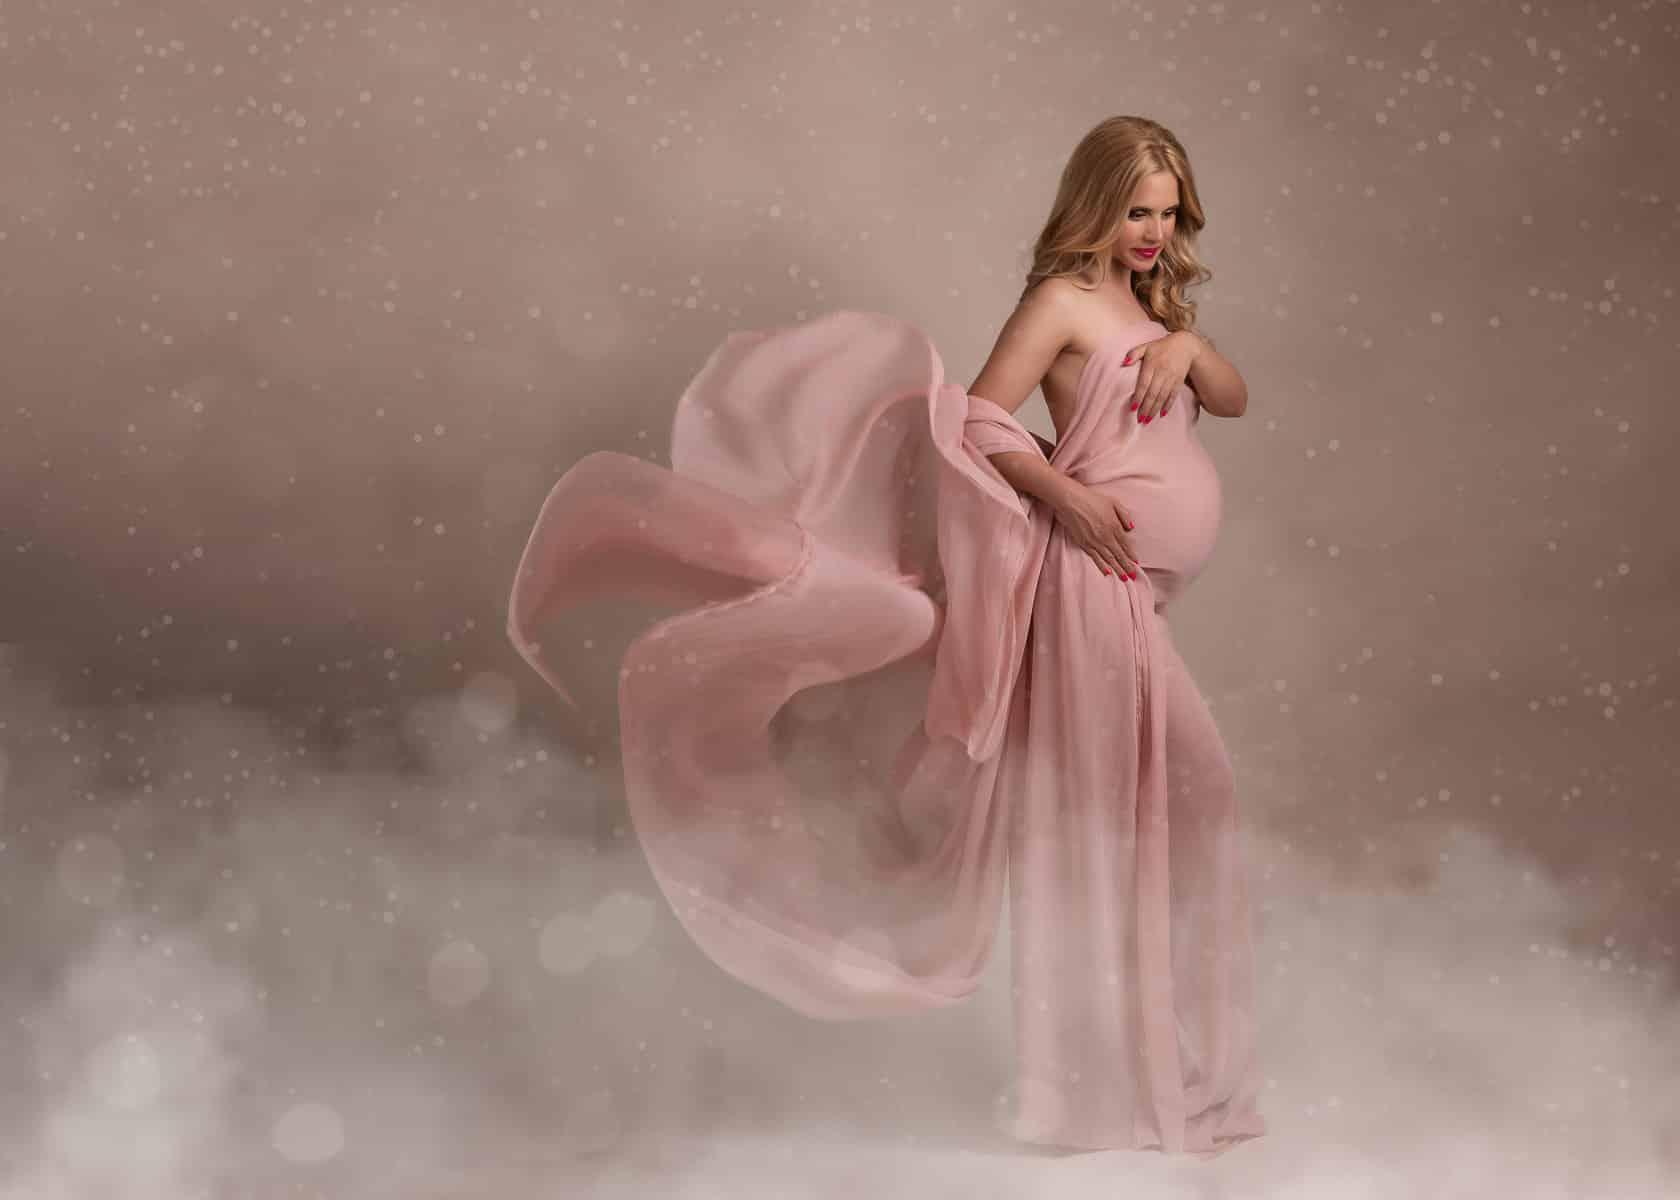 KRISTINA RECHE Petit Monde WORKSHOP FOTOGRAFIA MATERNITY EMBARAZO 9001 - Maternity